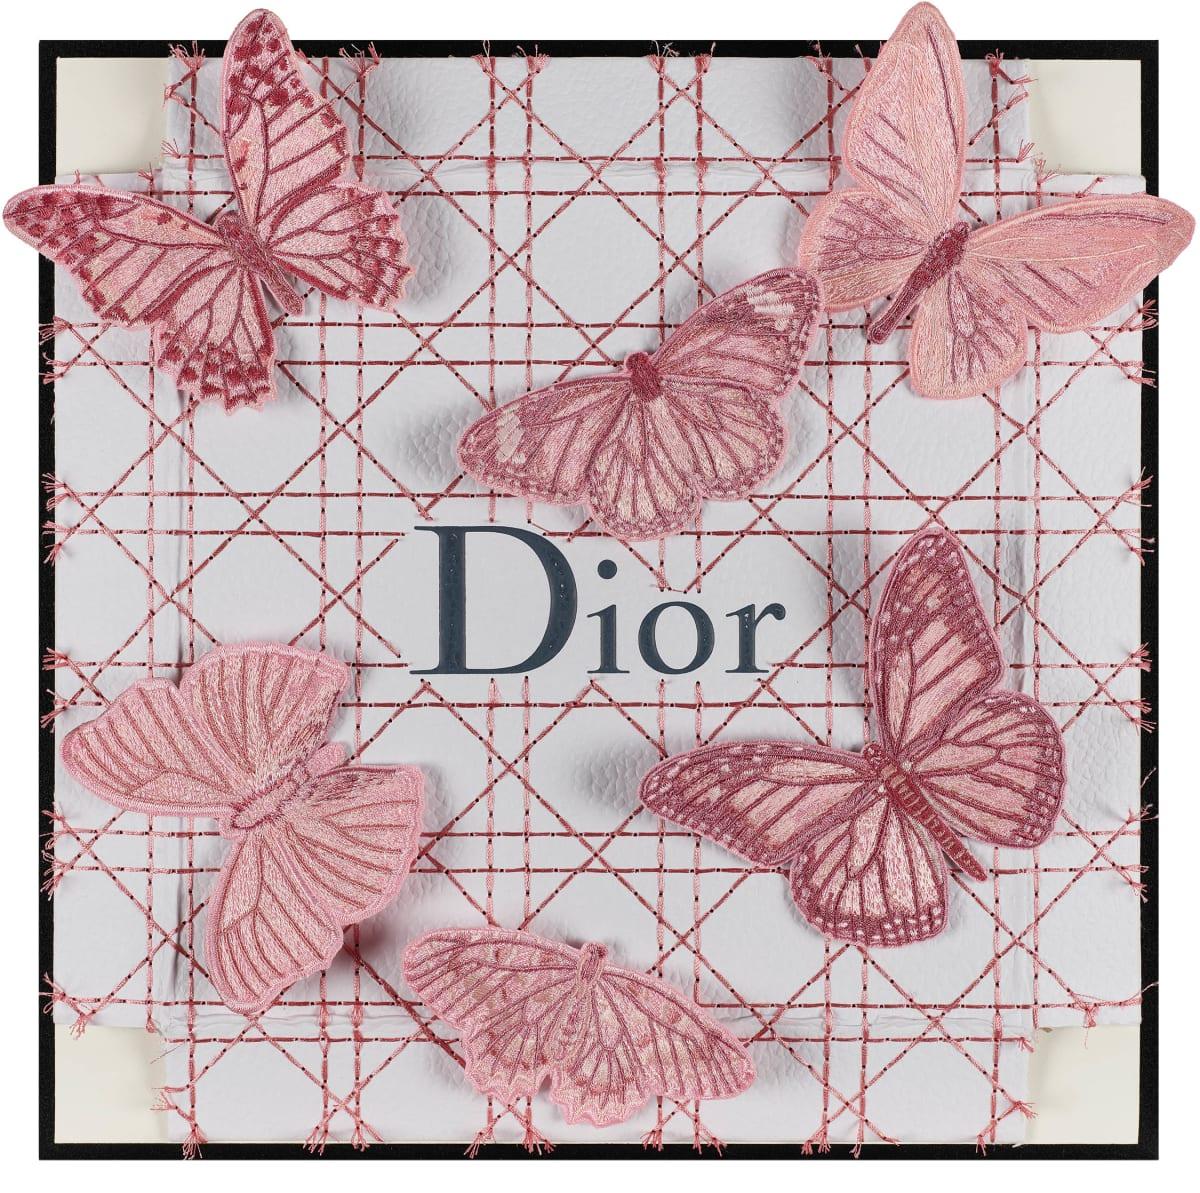 Stephen Wilson, Dior Pink Flutter II, 2019